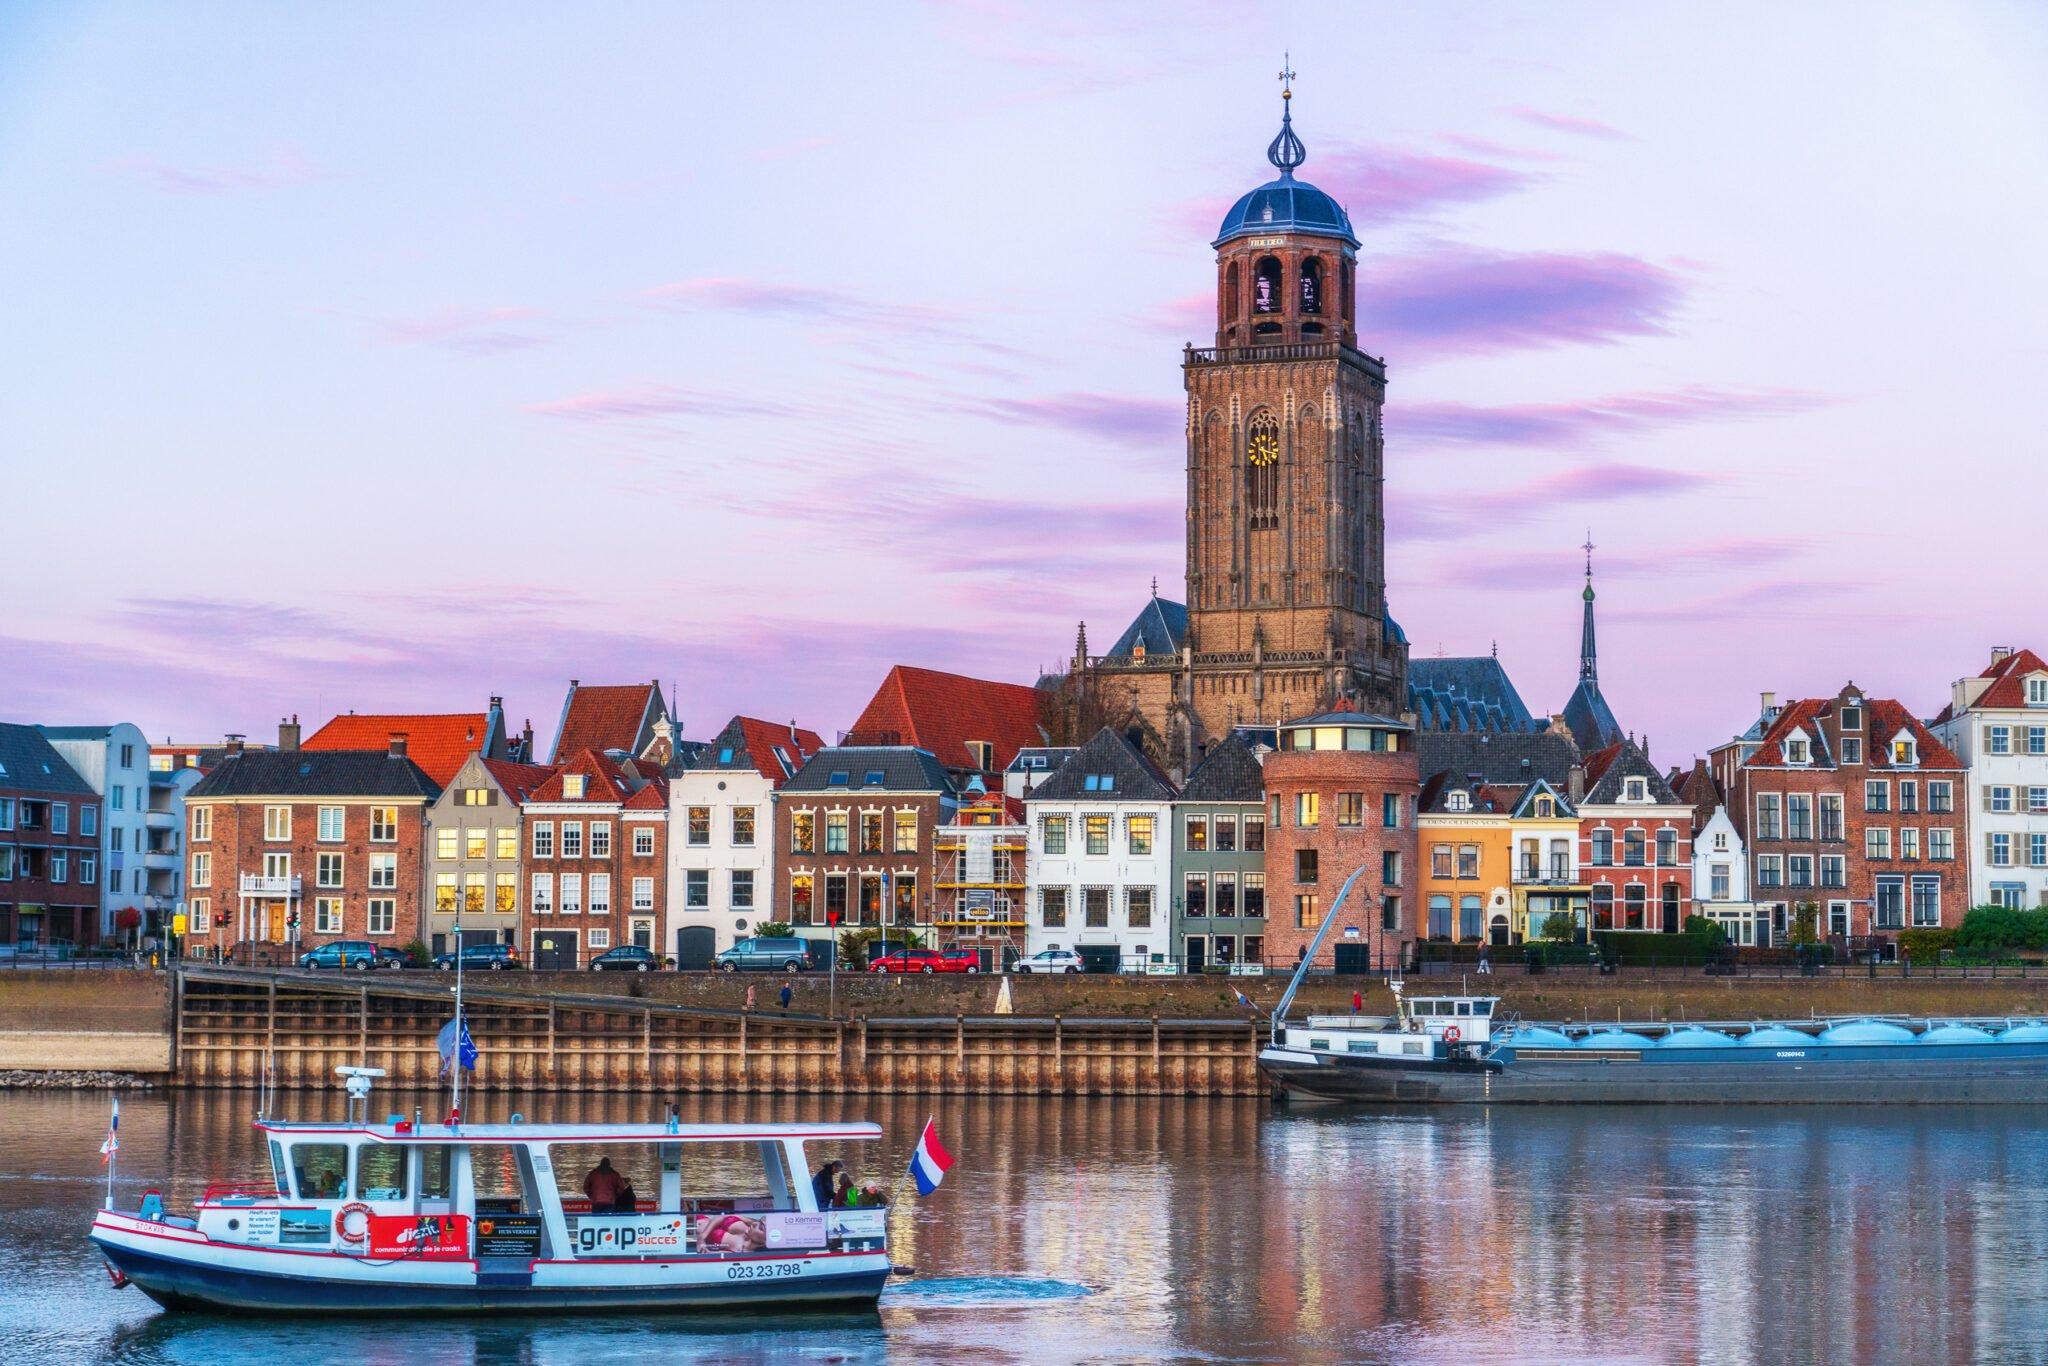 skyline-Deventer-bart ros